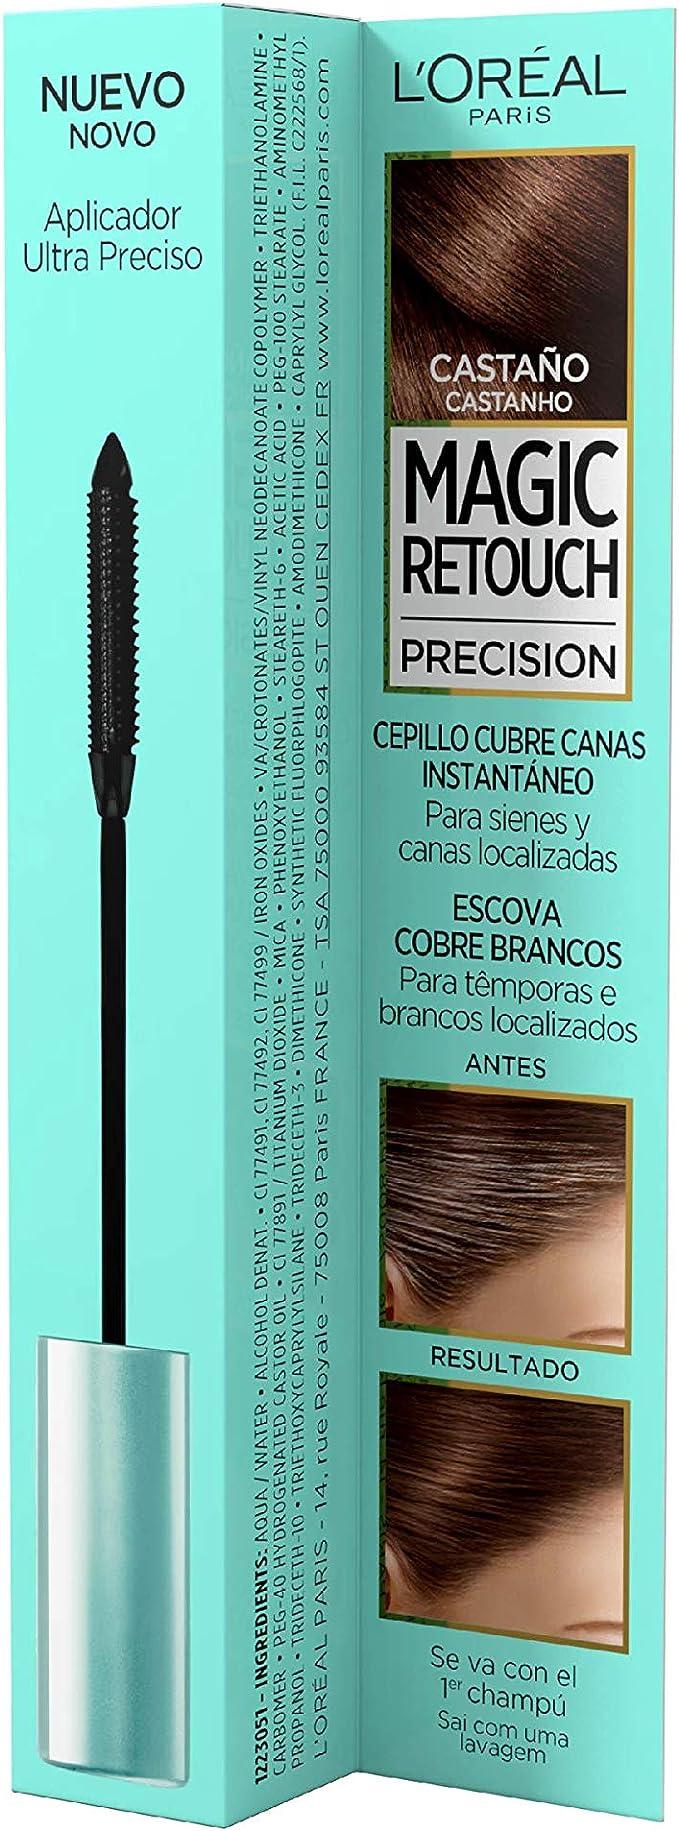 LOréal Magic Retouch Precision Castaño: Amazon.es: Belleza